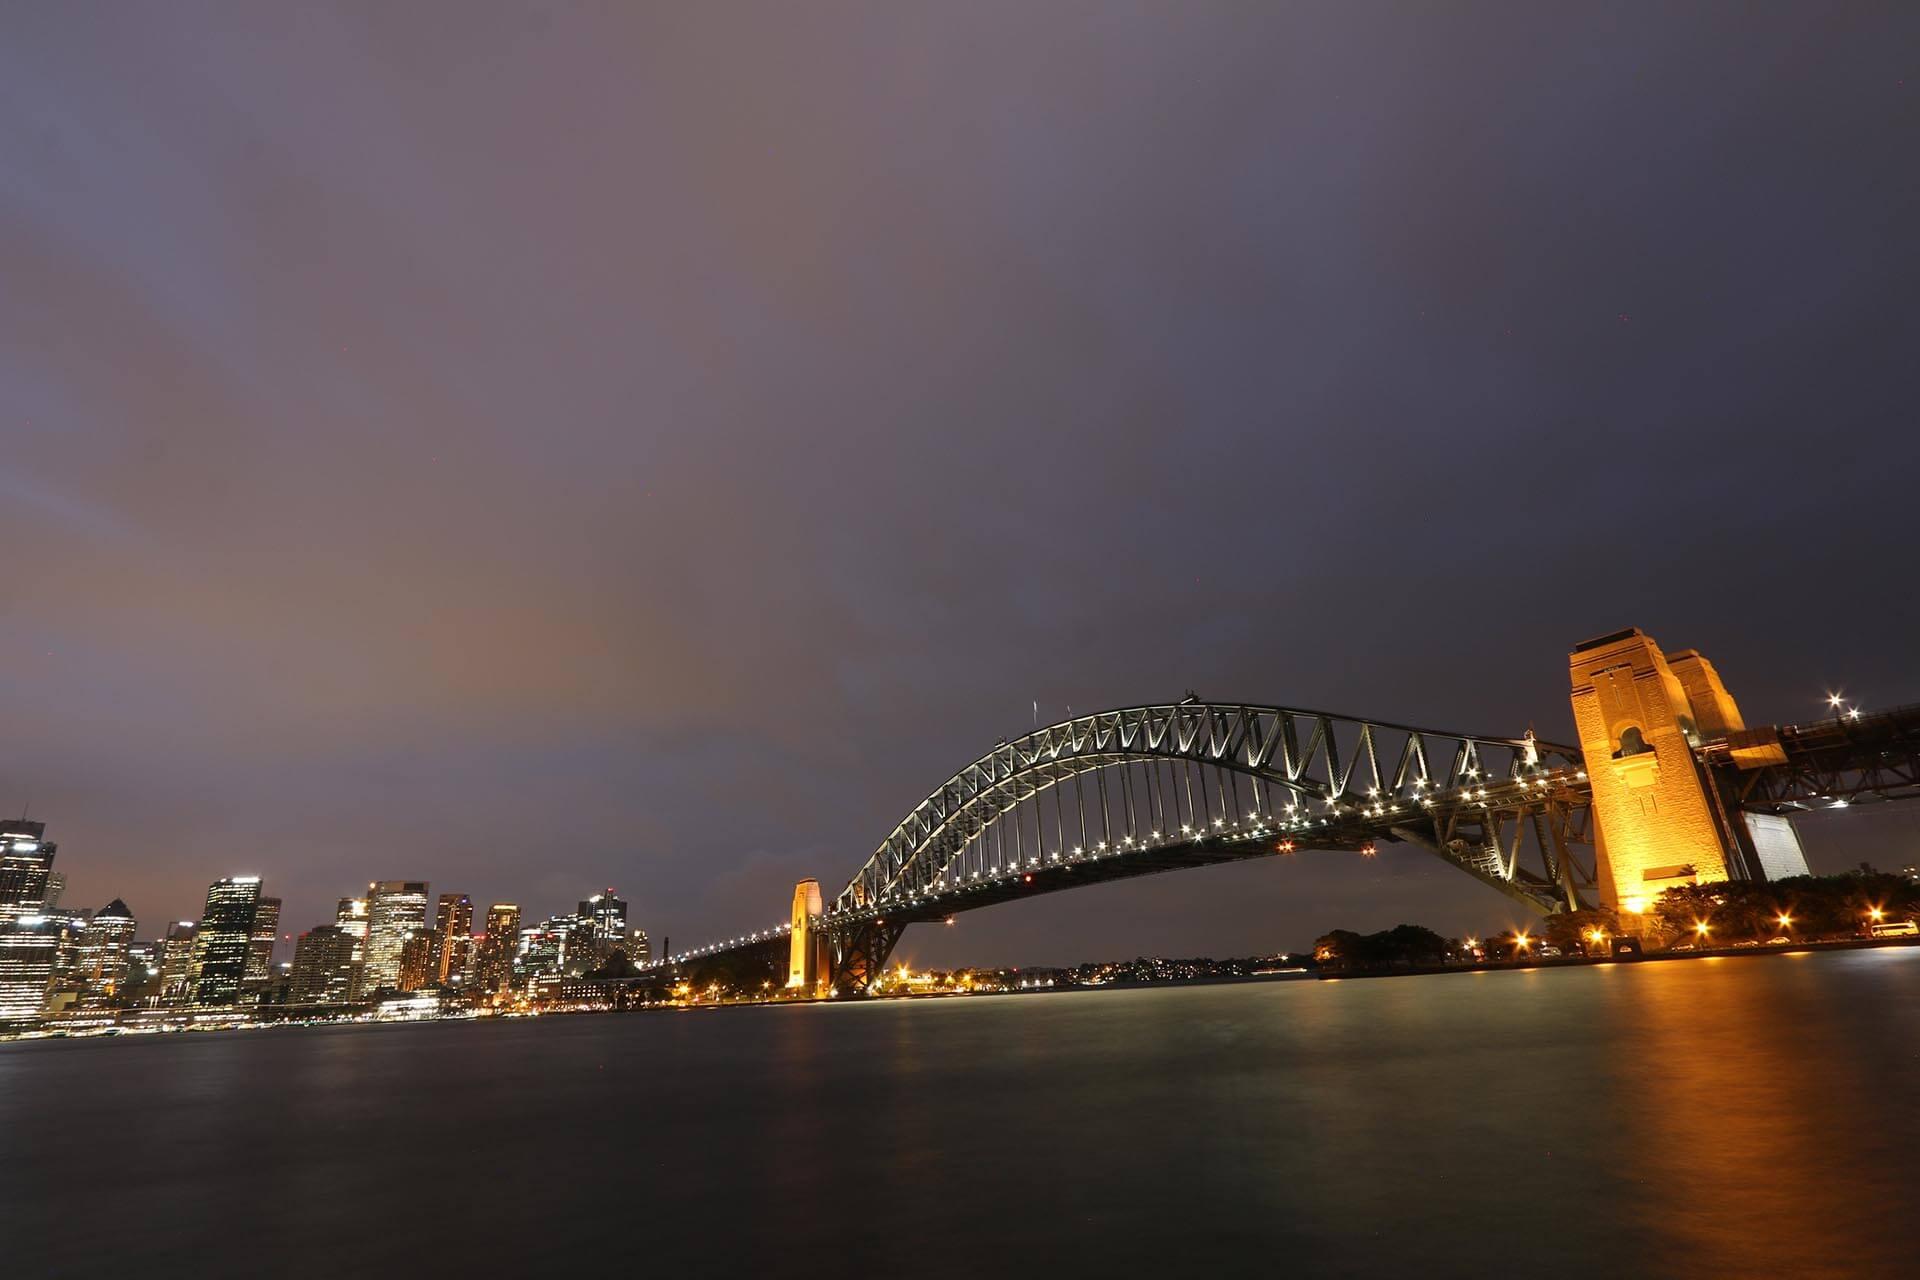 Sydney Harbour Bridge at Night John Luhr Photography